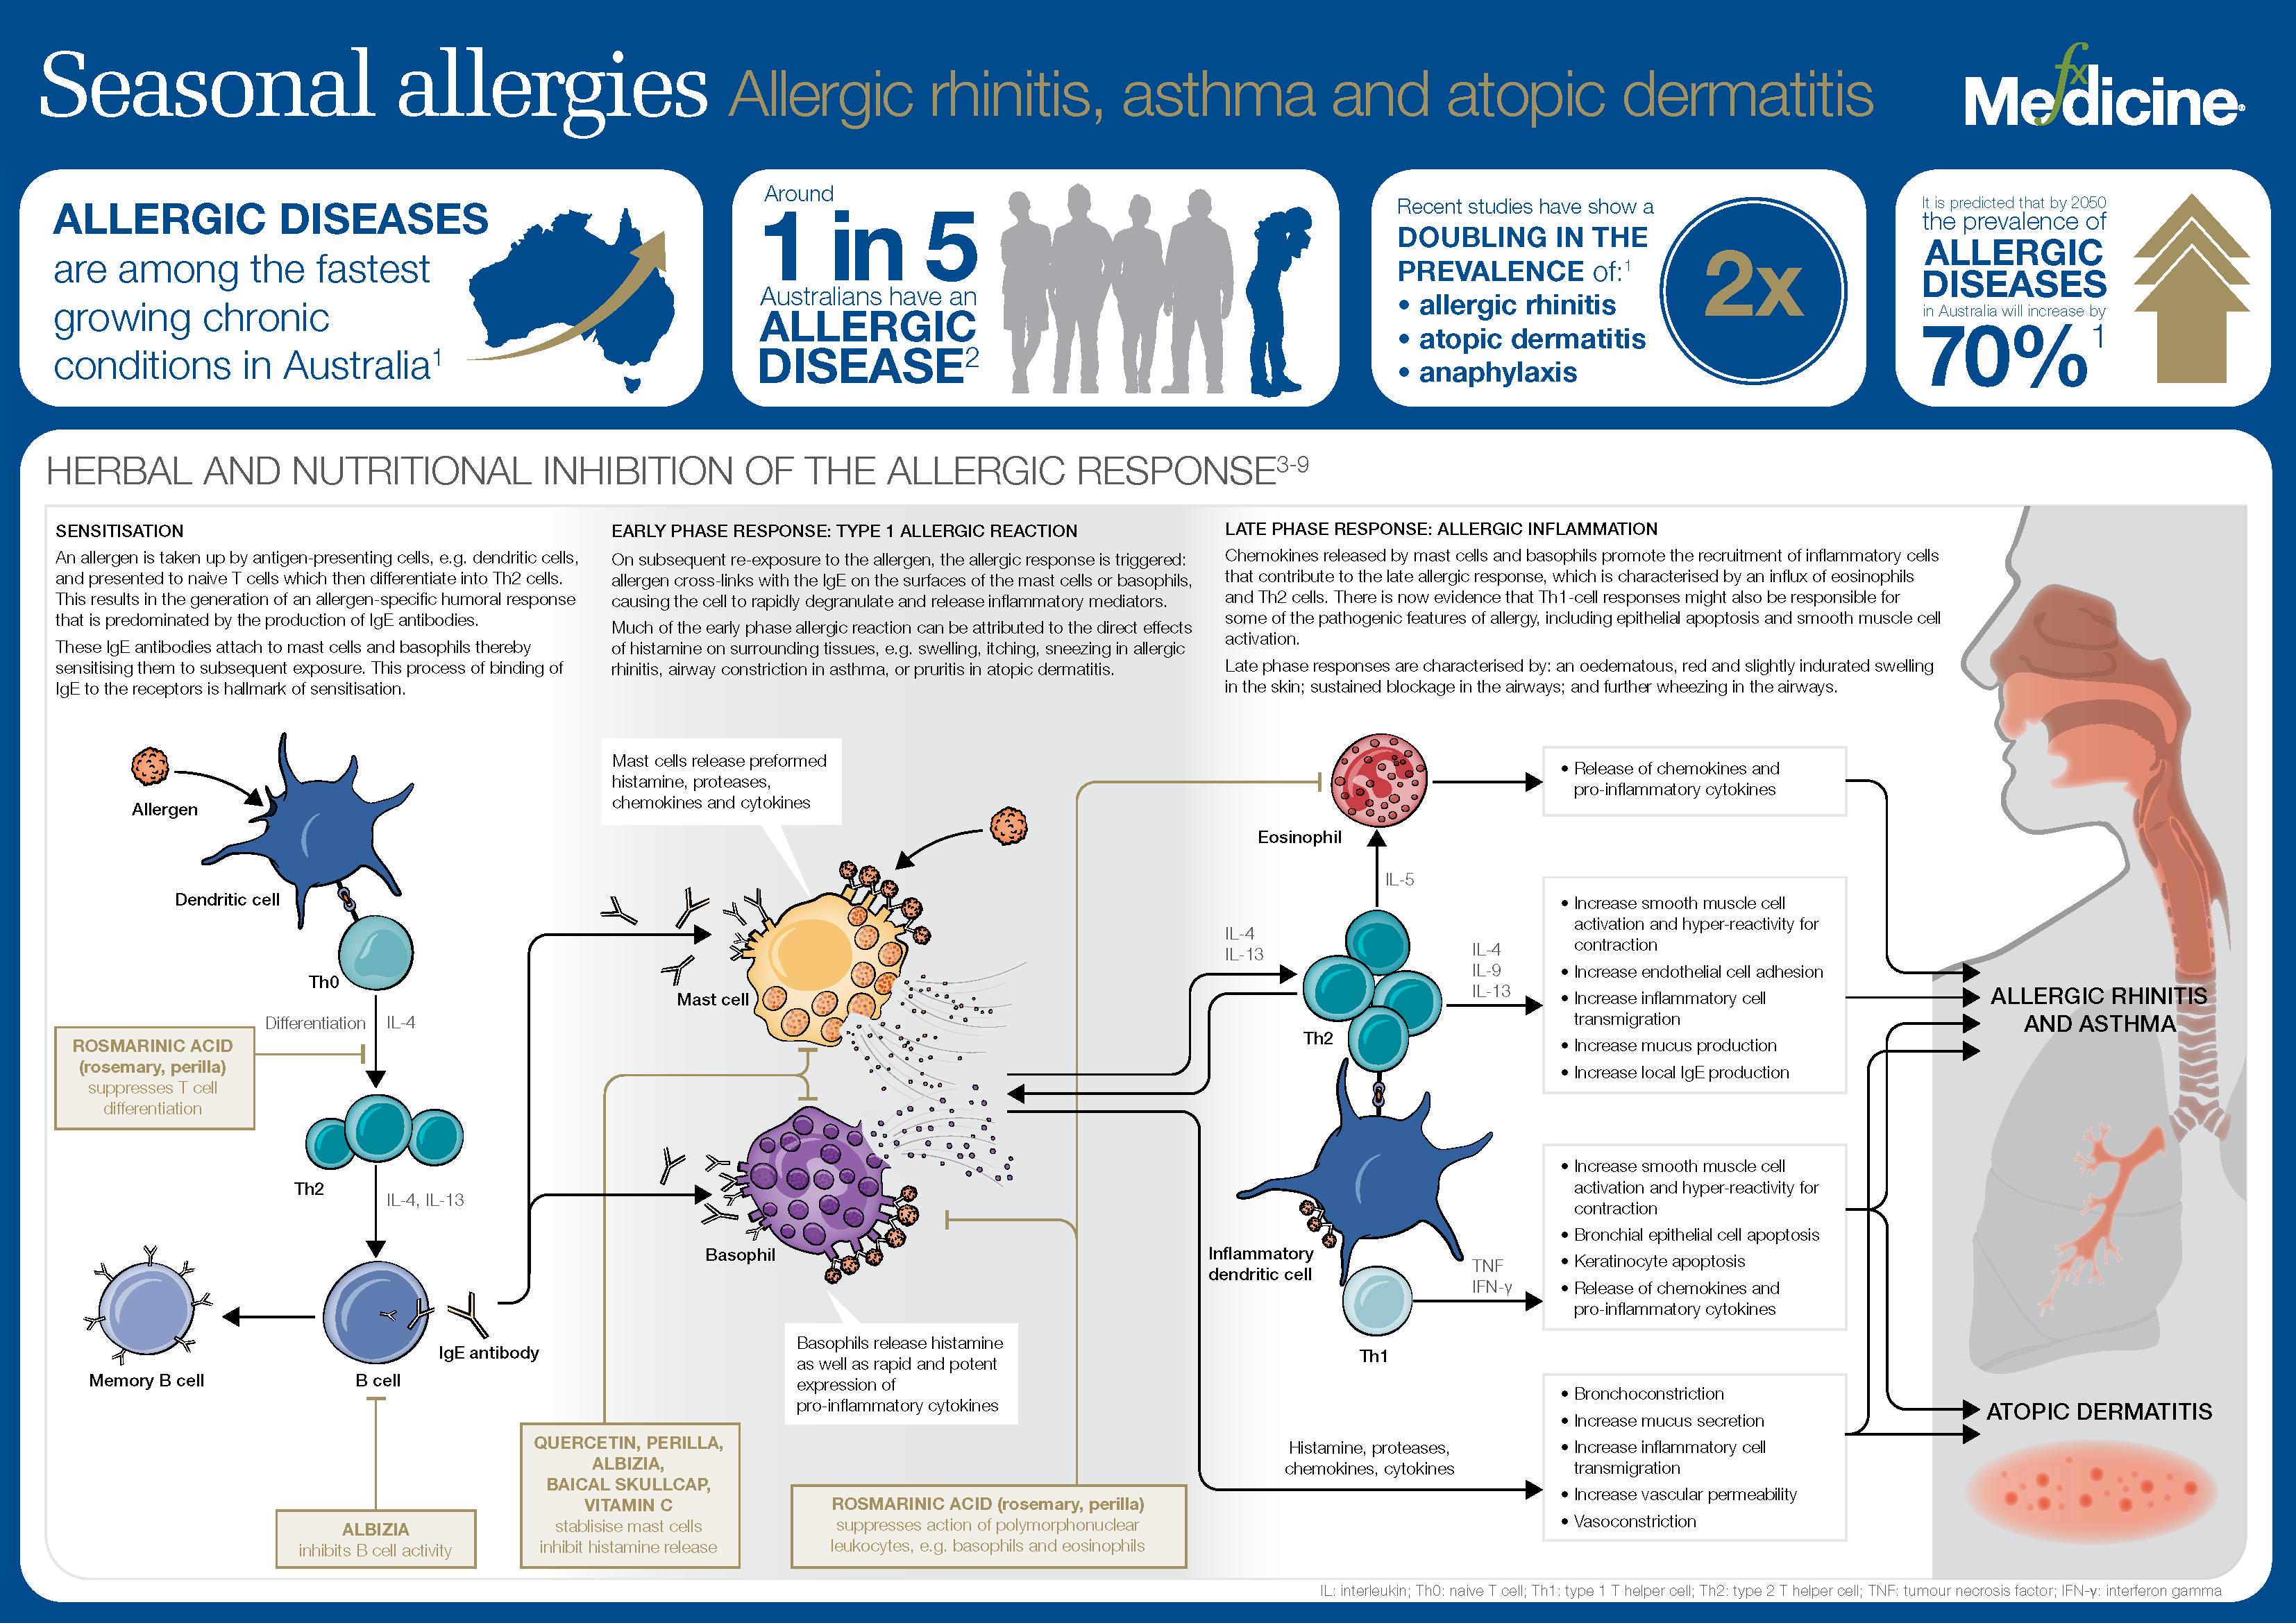 Seasonal allergies_INFOGRAPHIC_FX MEDICINE.png